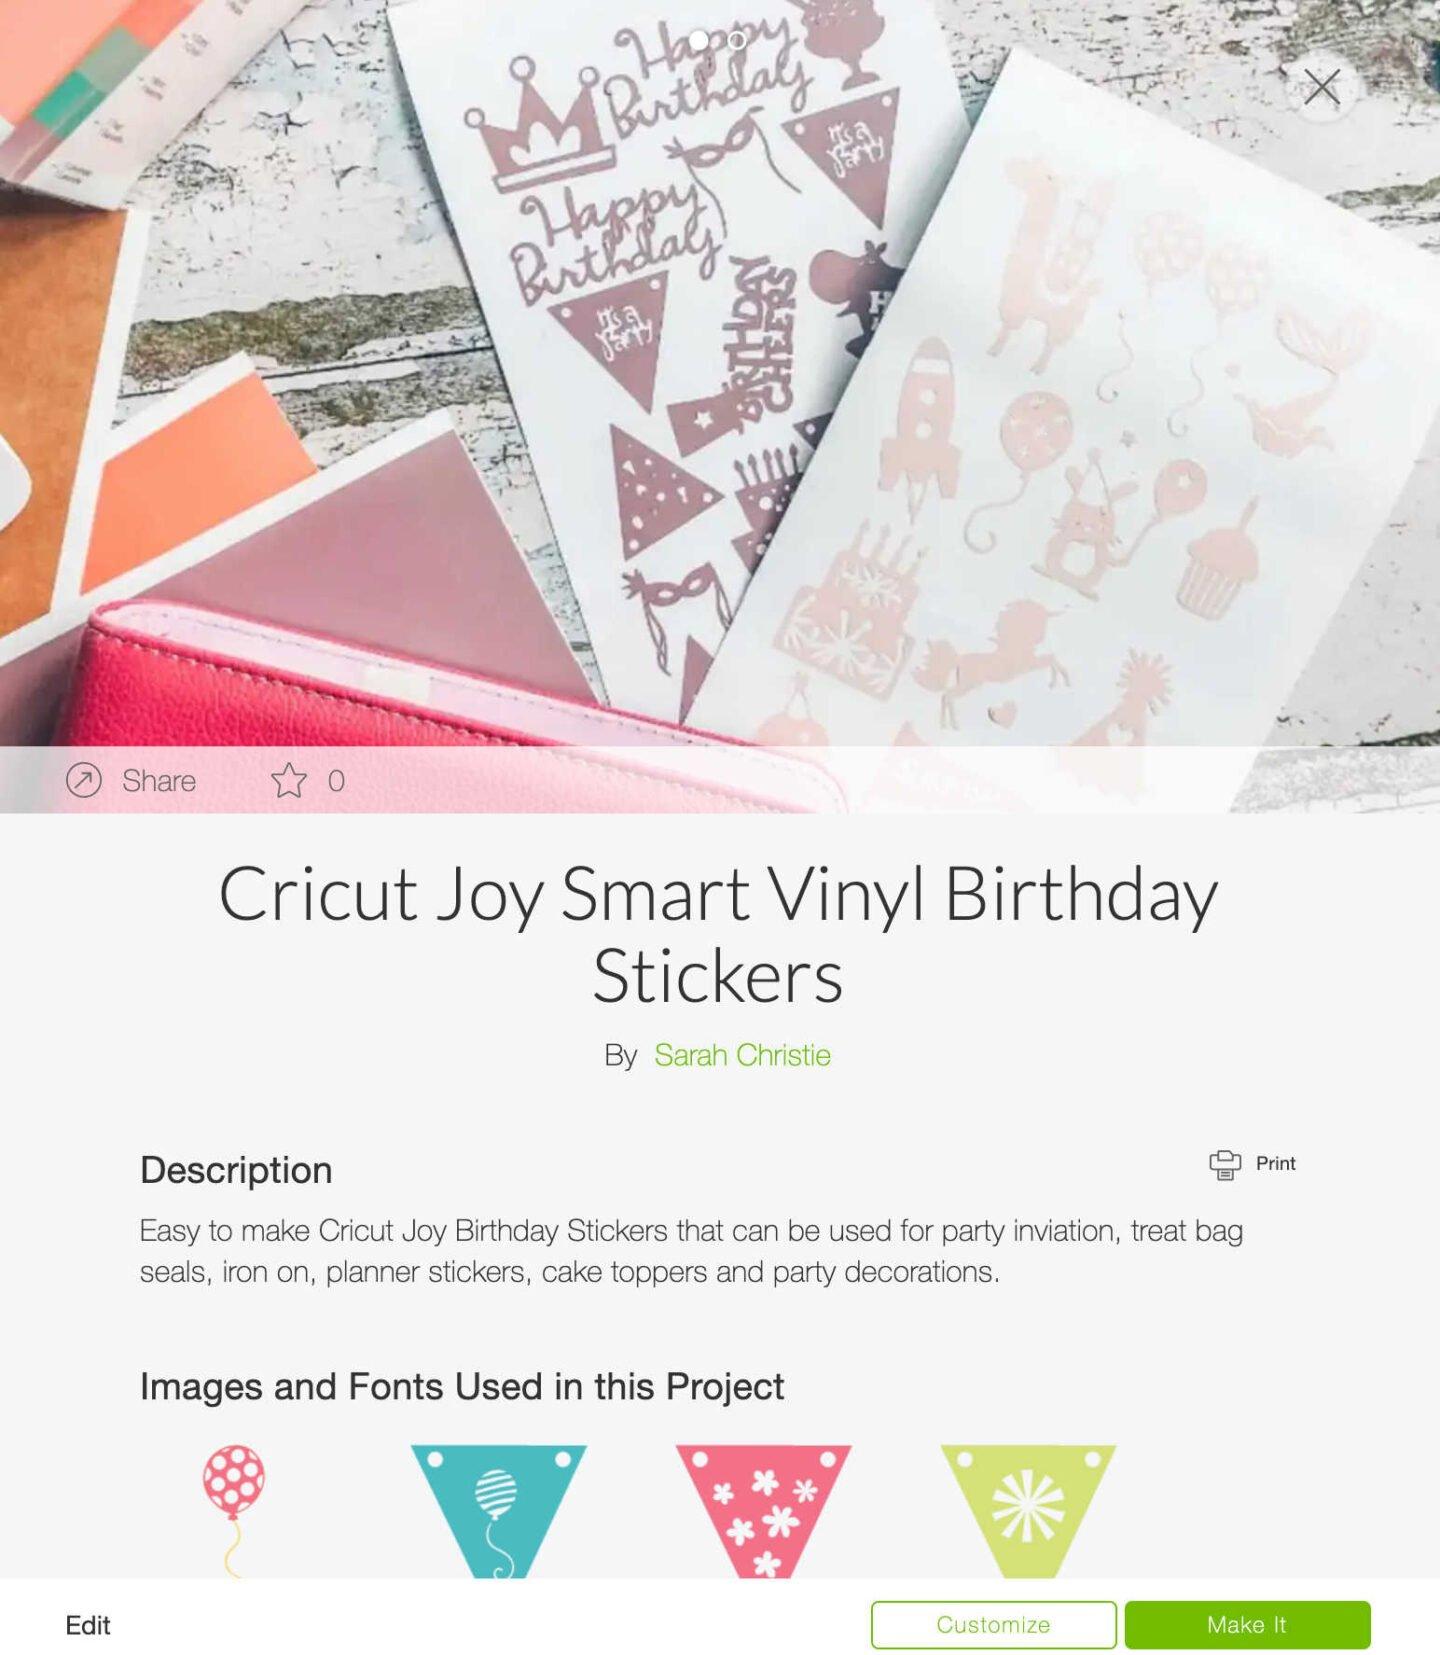 Cricut Joy Smart Vinyl Birthday Stickers Design Space Template